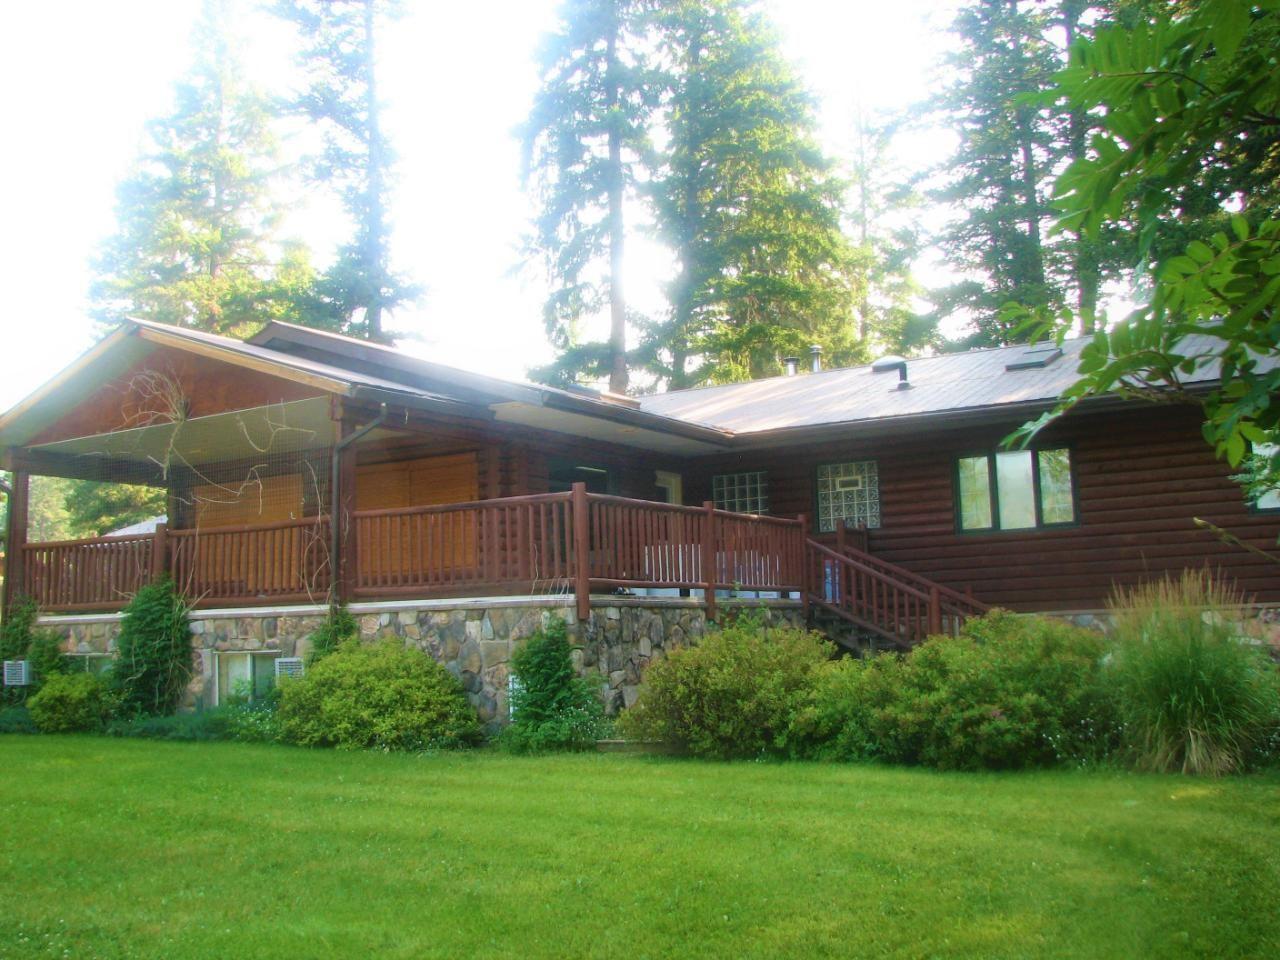 Main Photo: 4931 Dunn Lake Road in Barriere: BA House for sale (NE)  : MLS®# 162276